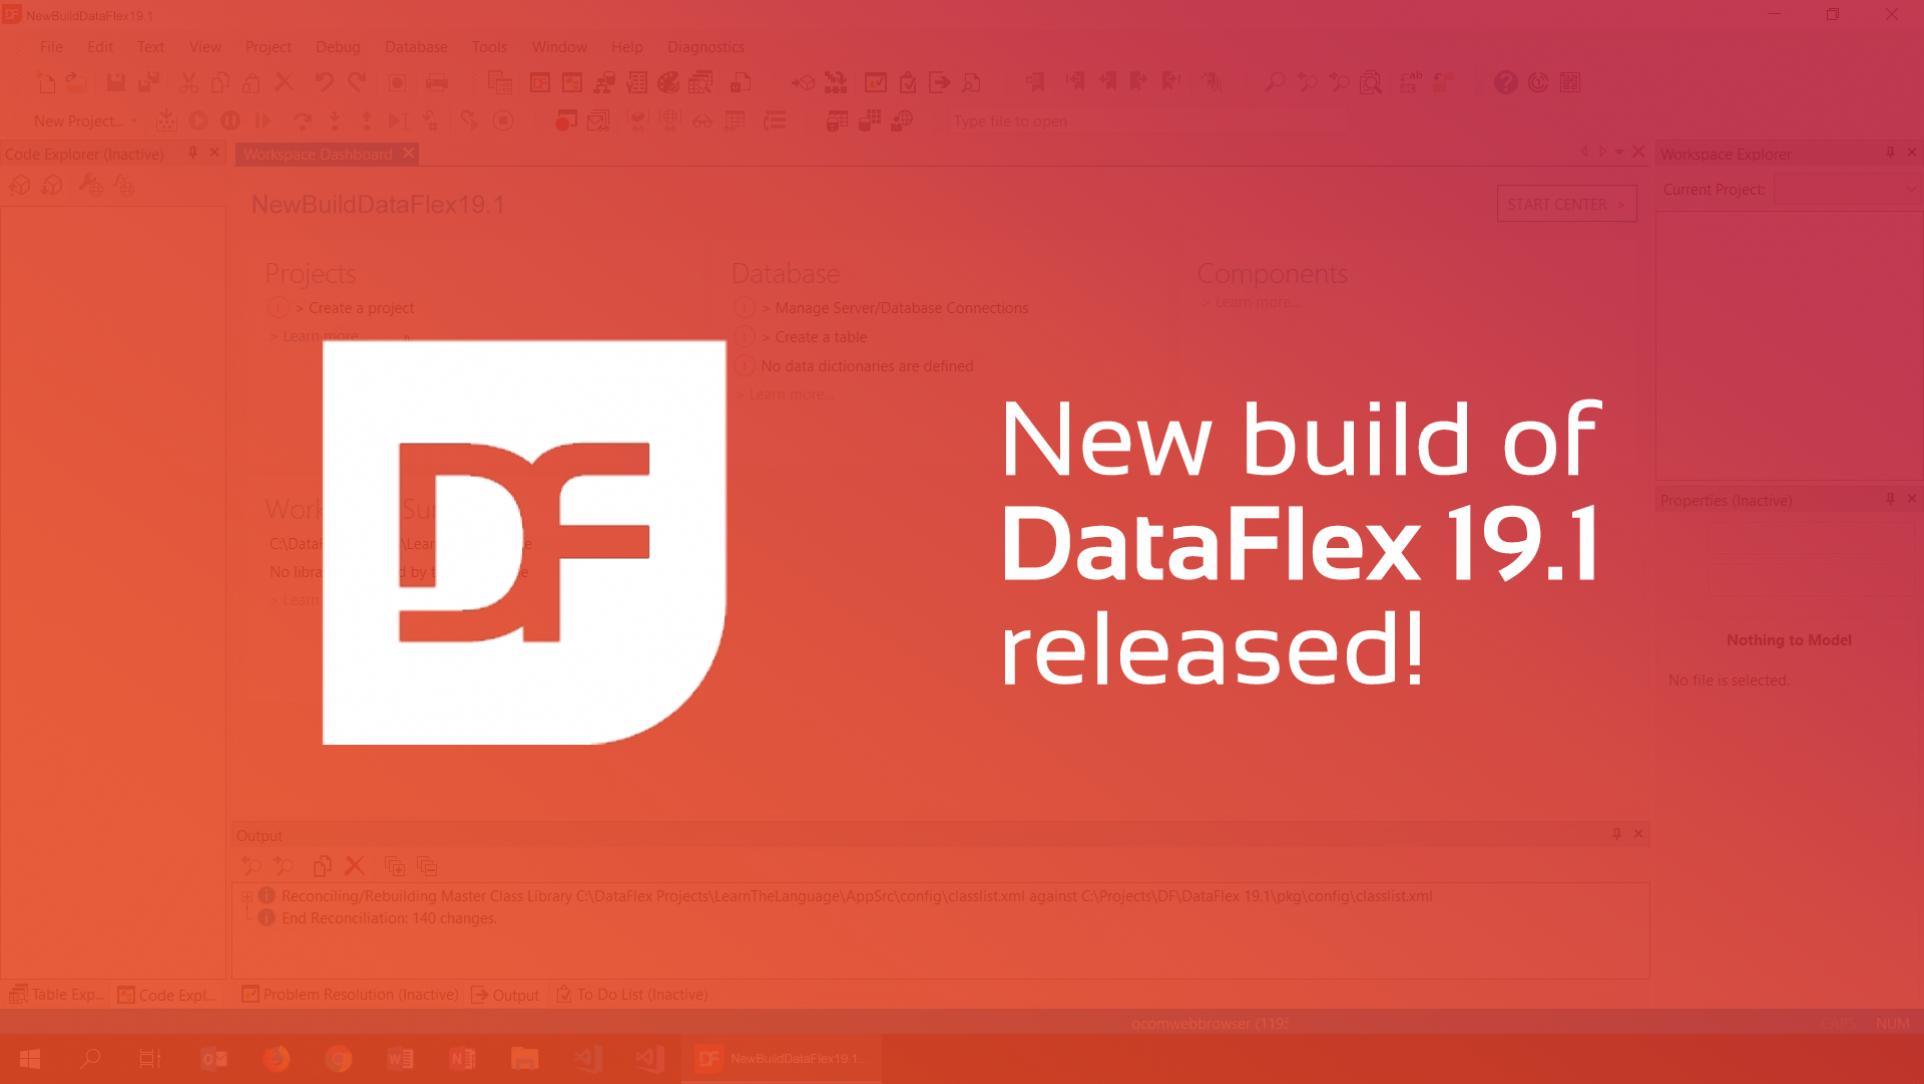 2019-10-25 DataFlex 19.1 New Build